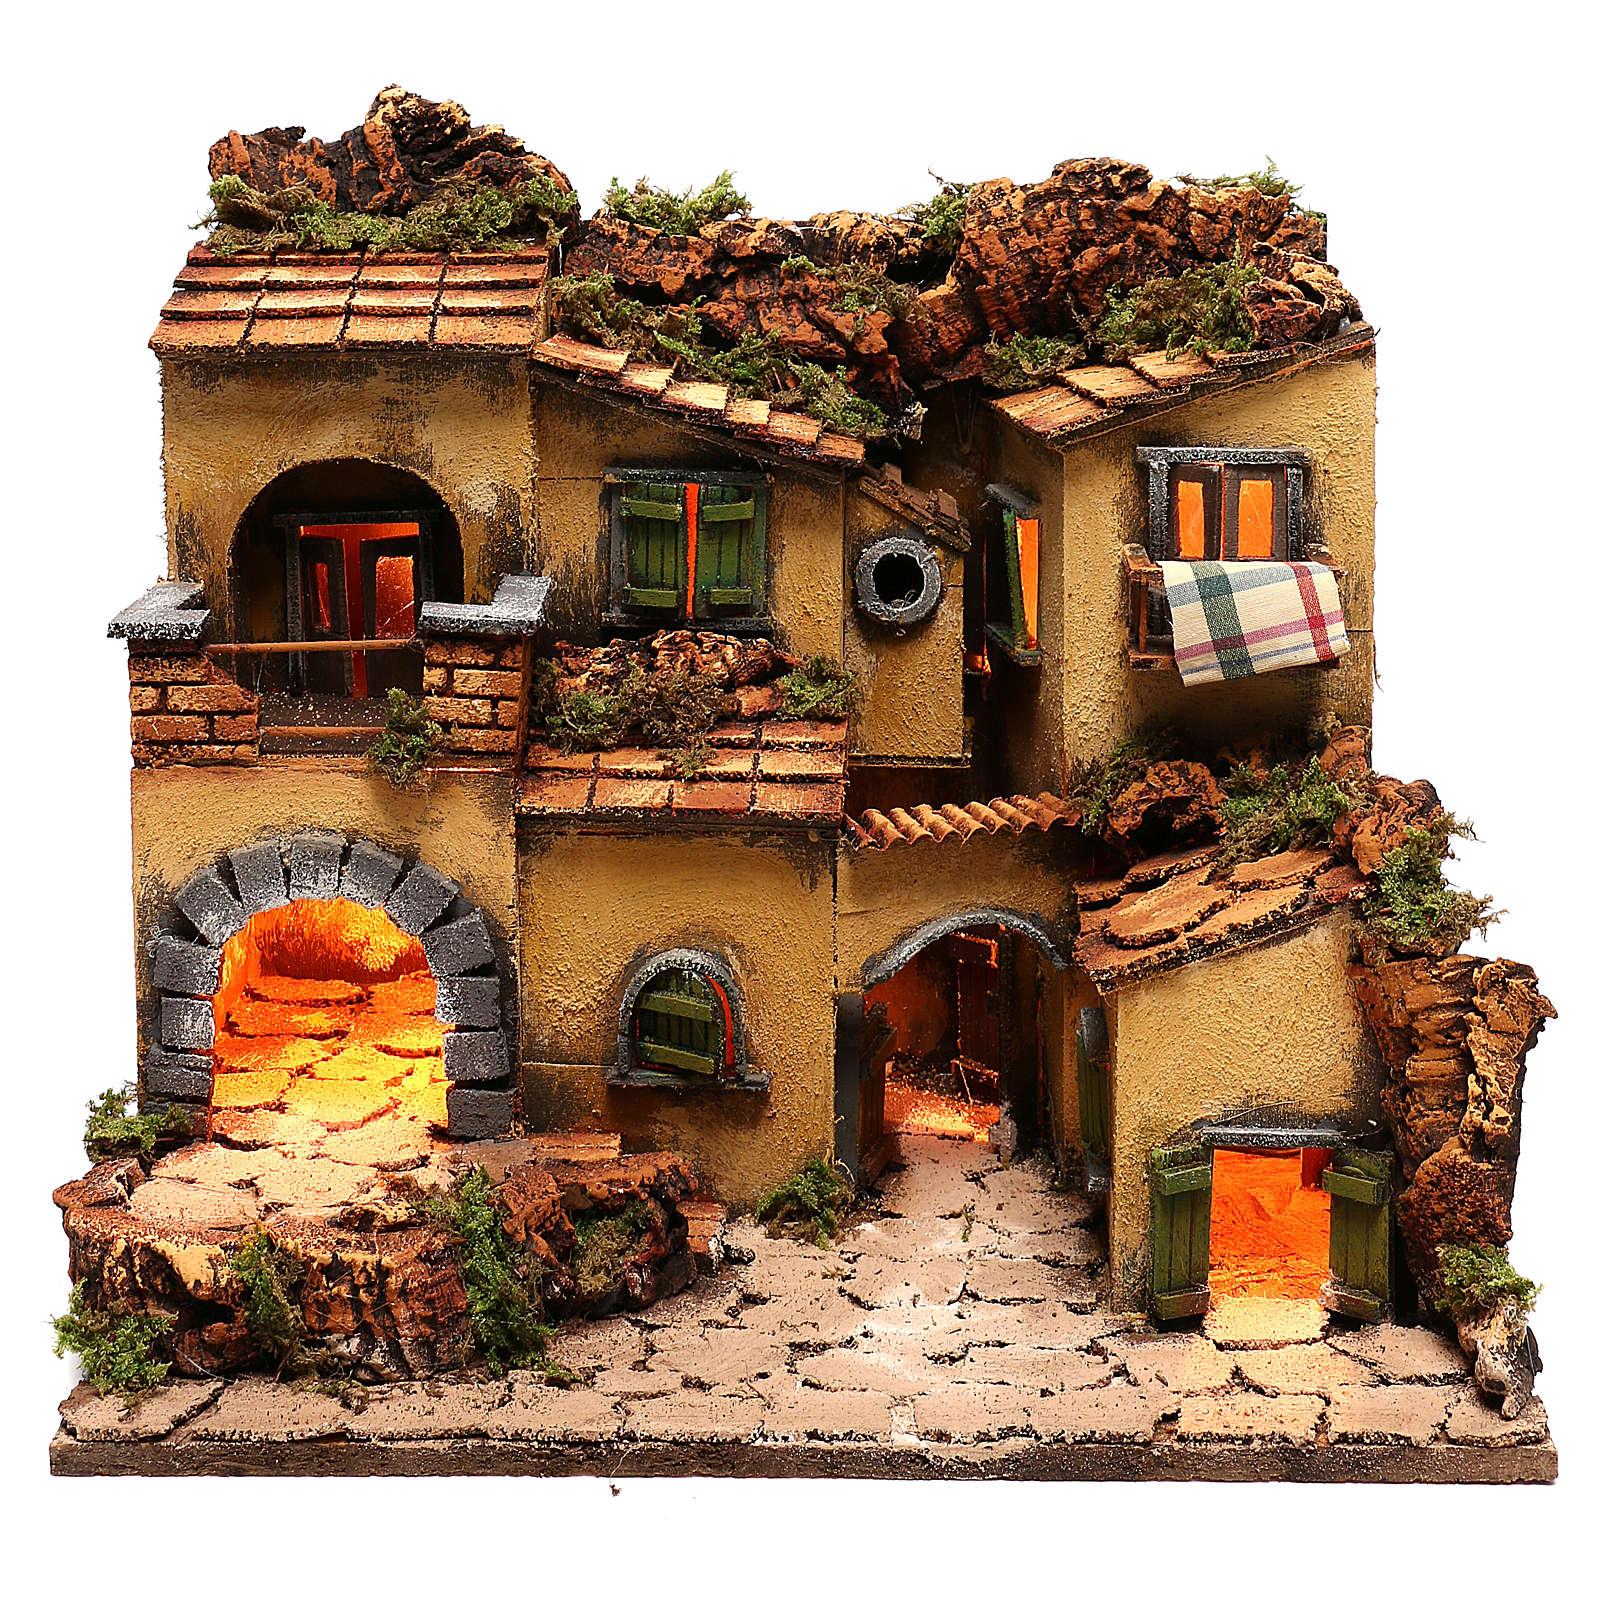 Borgo presepe stile 700 napoletano cm 45x35x33 4